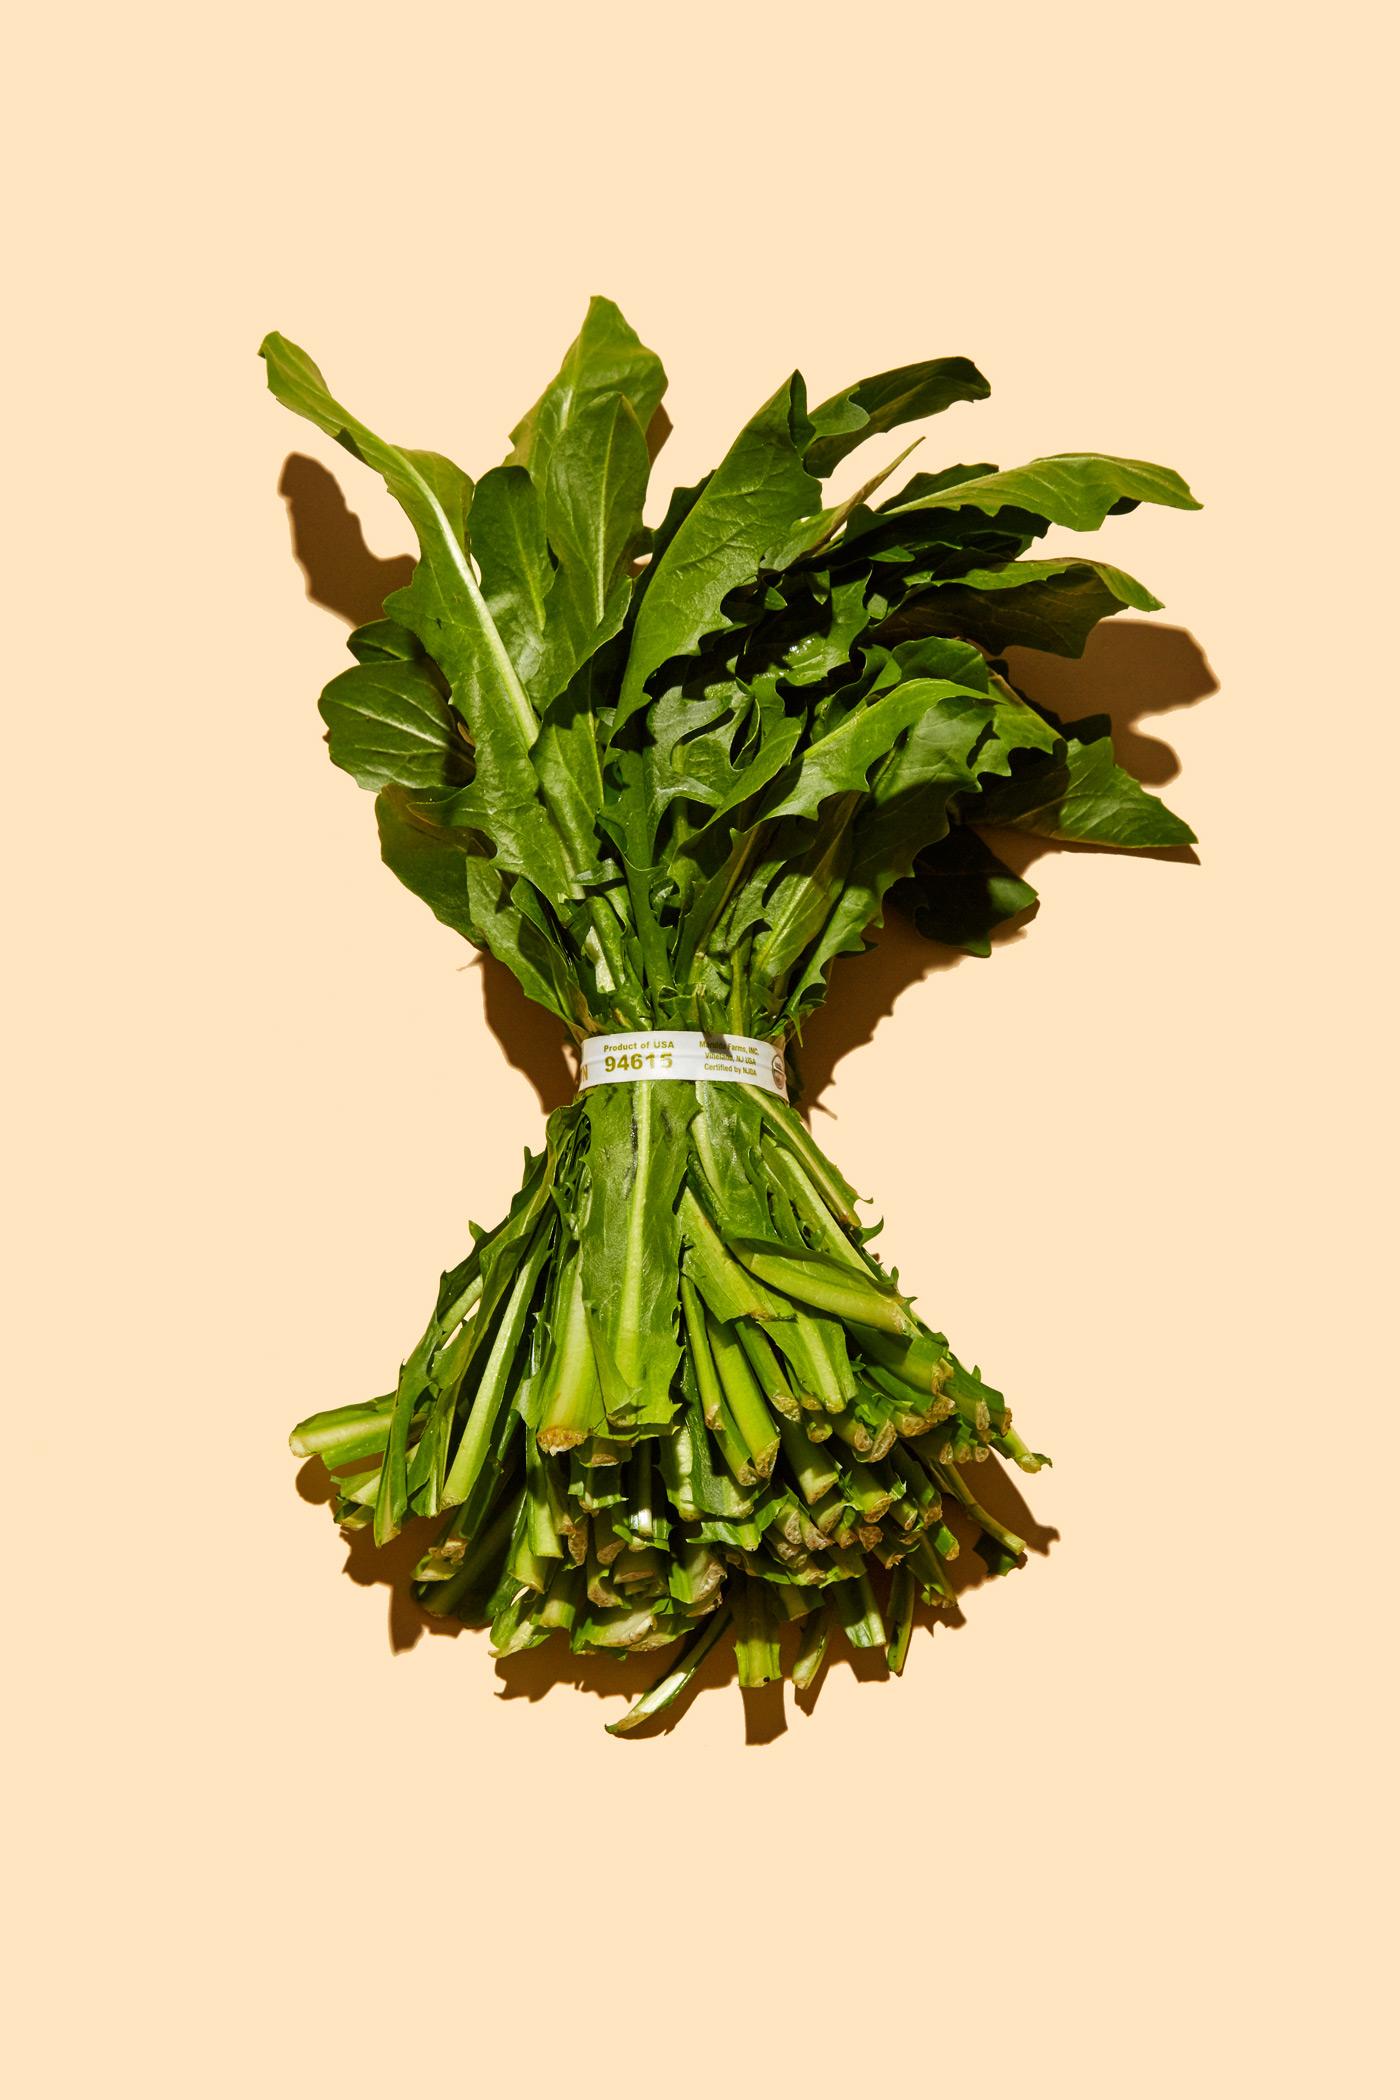 healthiest foods, health food, diet, nutrition, time.com stock, dandelion greens